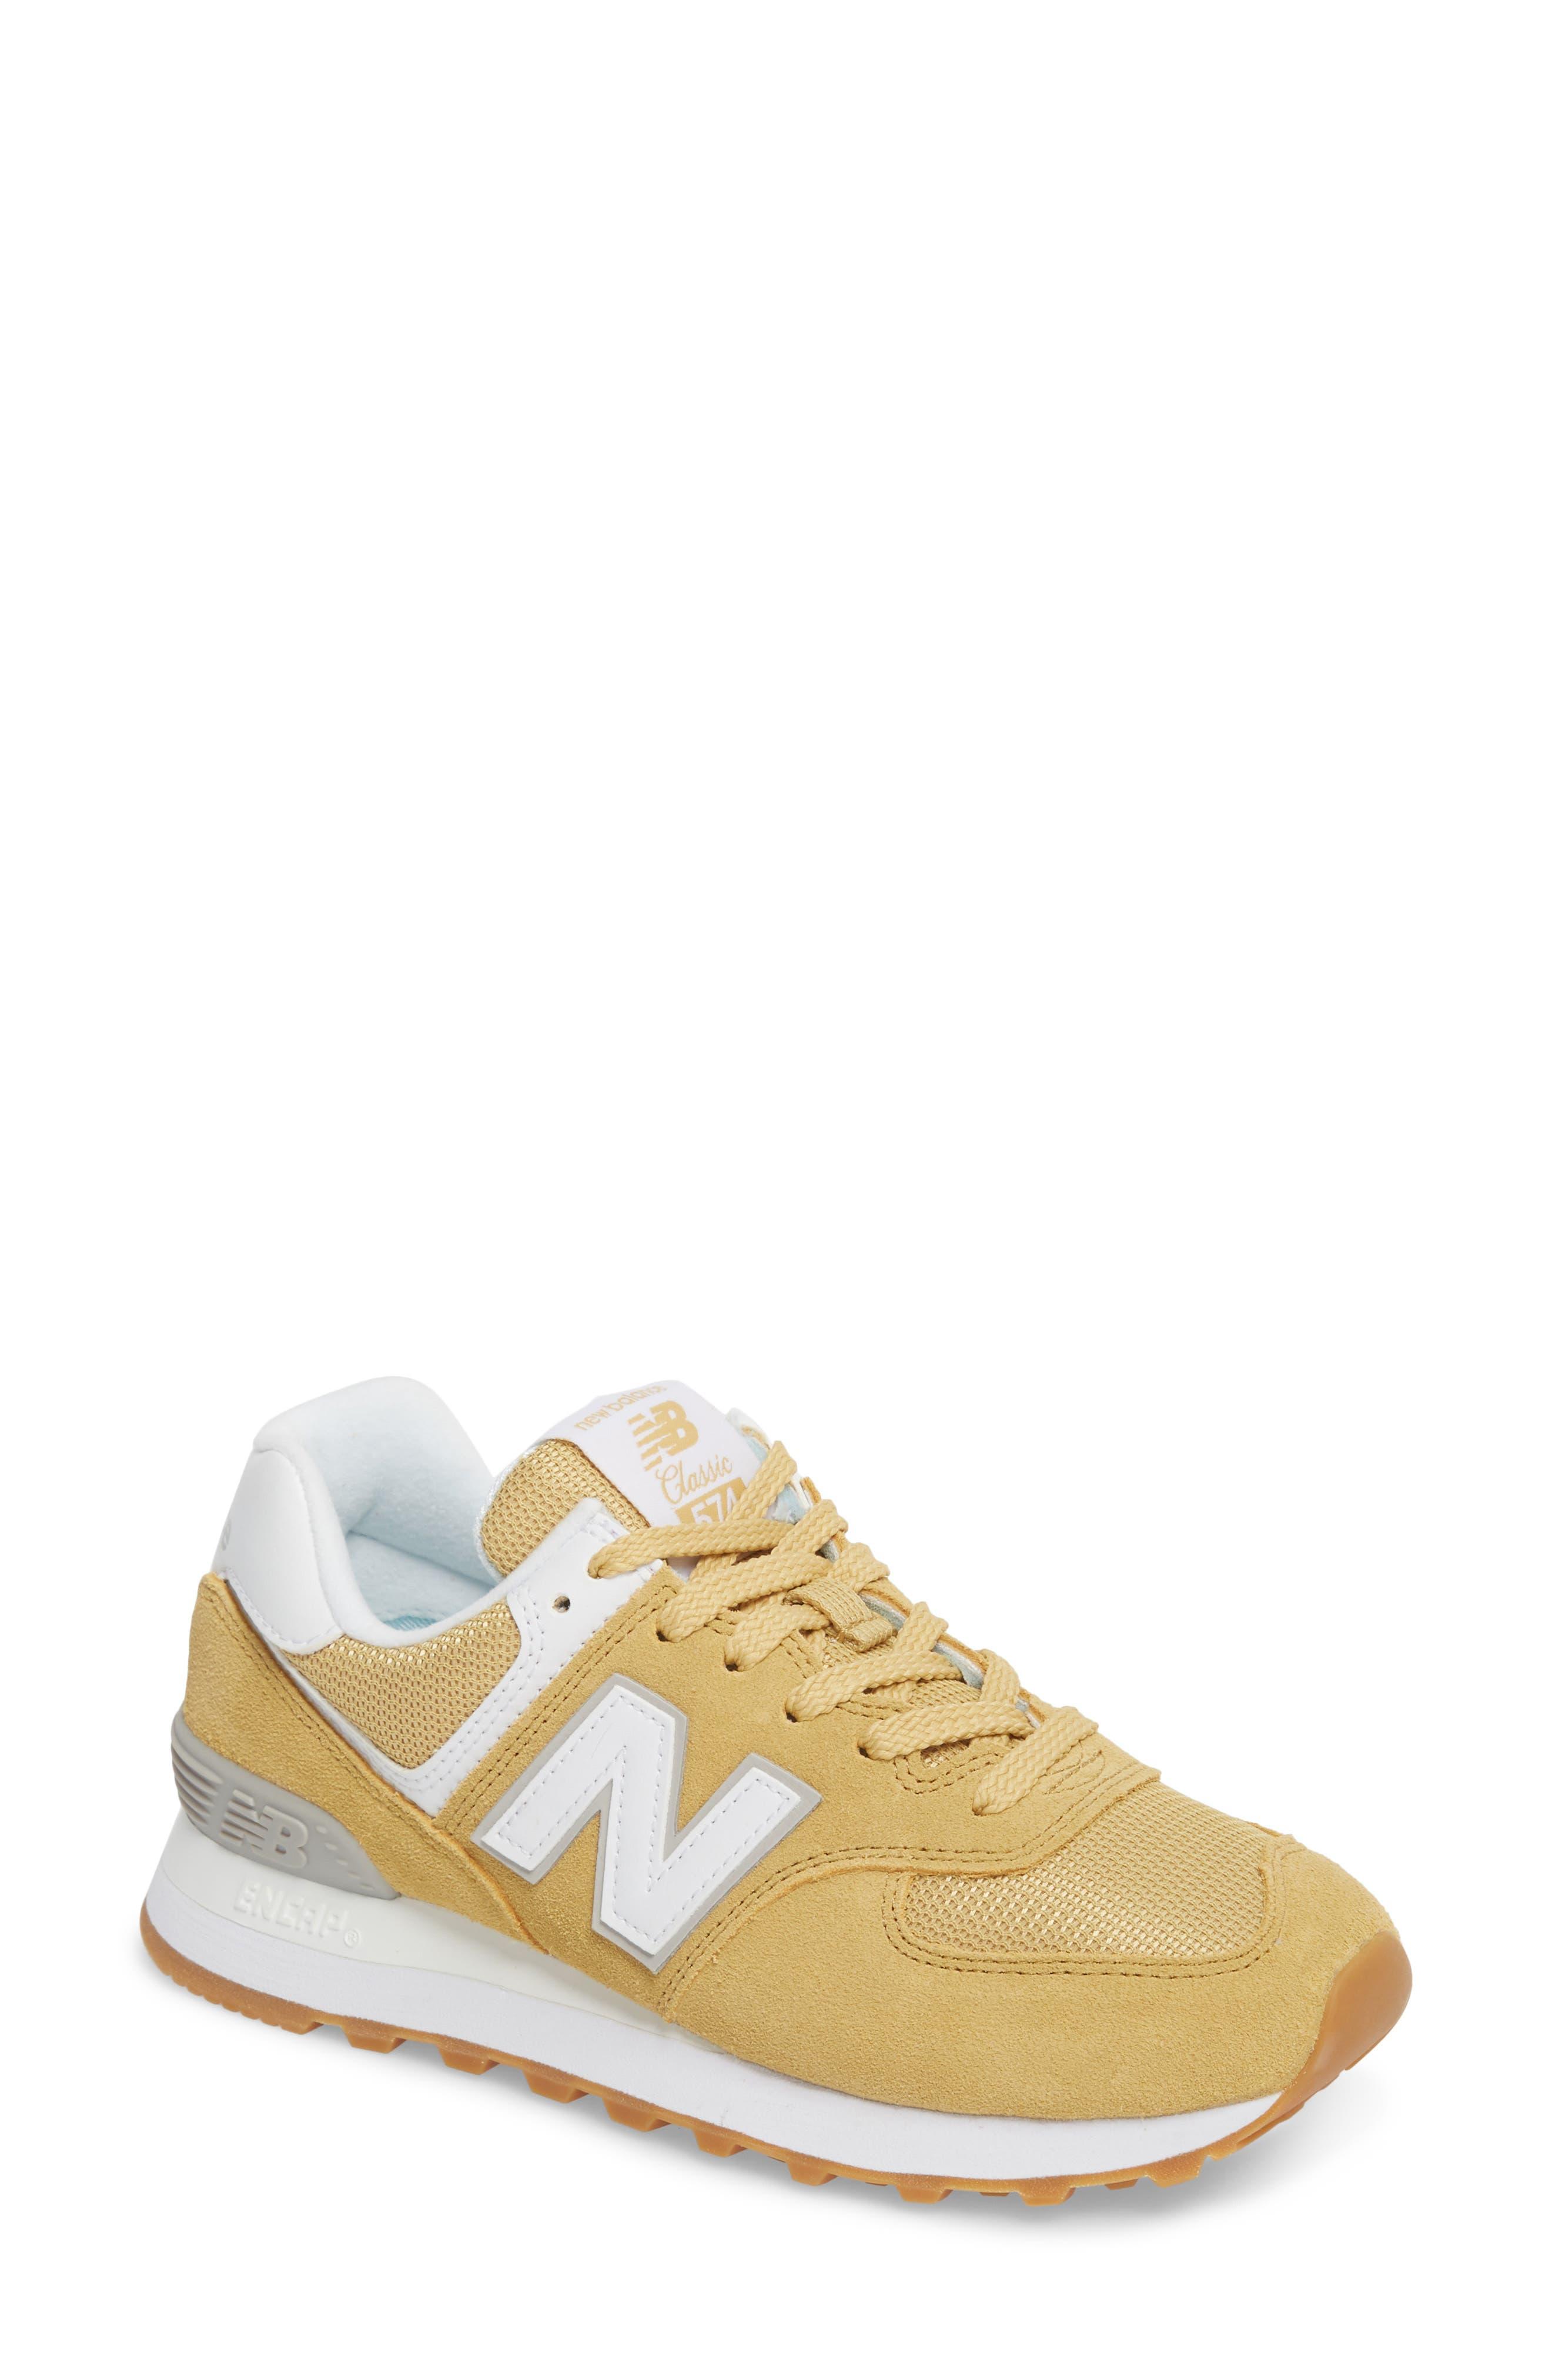 New Balance 574 Beach Chambray Sneaker (Women)